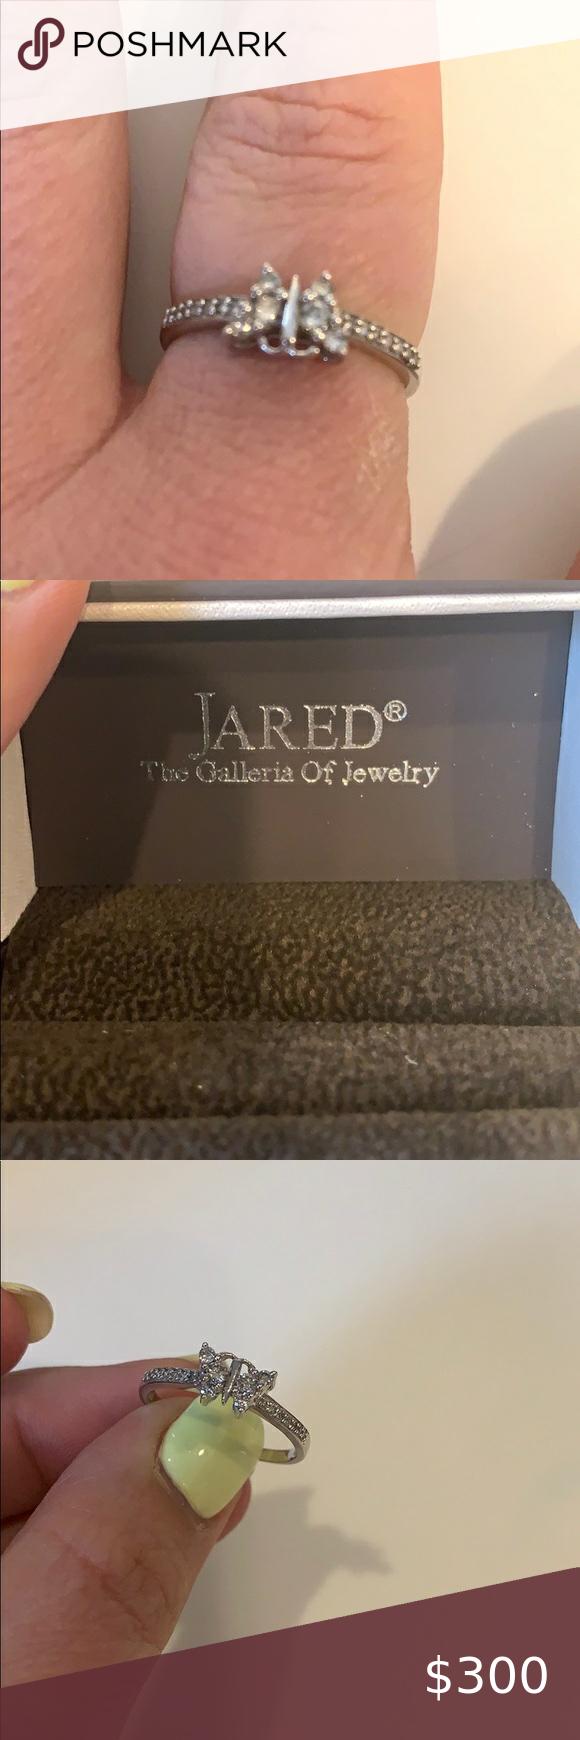 Beautiful Butterfly Ring! Speaks for itself 💛 Full of Diamonds! Jared's jar... -  Beautiful Butterfly Ring! Speaks for itself 💛 Full of Diamonds! Jared's jared Jewelry Rings  - #Beautiful #butterfly #diamonds #diyjewelryorganizers #Full #hangingjewelryorganizerdiy #itself #jar #jared #Jareds #jewelleryorganizerdiy #jewelryjared #jewelrykay #jewelryorganizerdiy #jewelrypandora #Ring #speaks